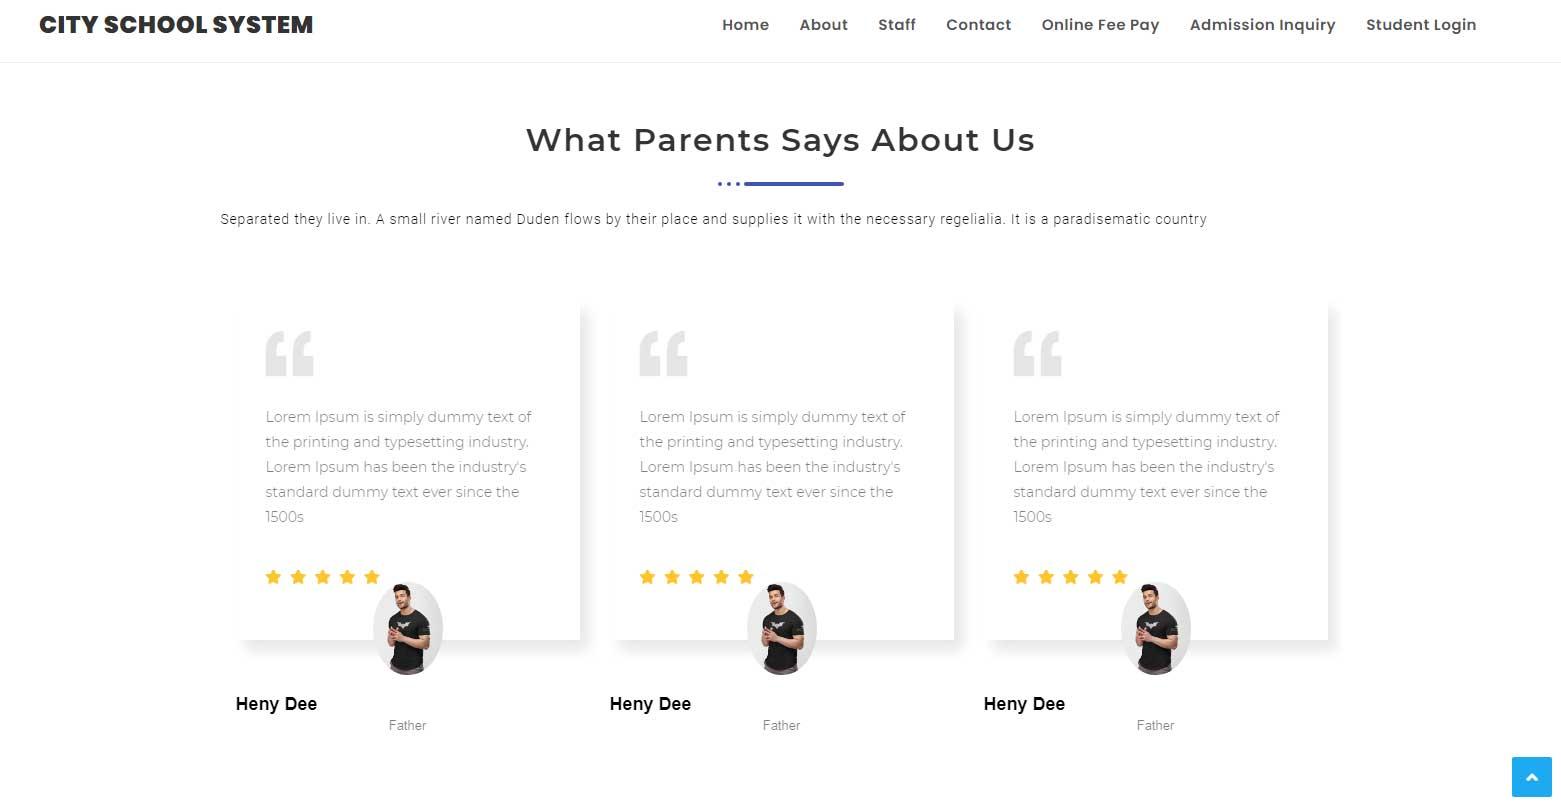 City-School-System-testimonials